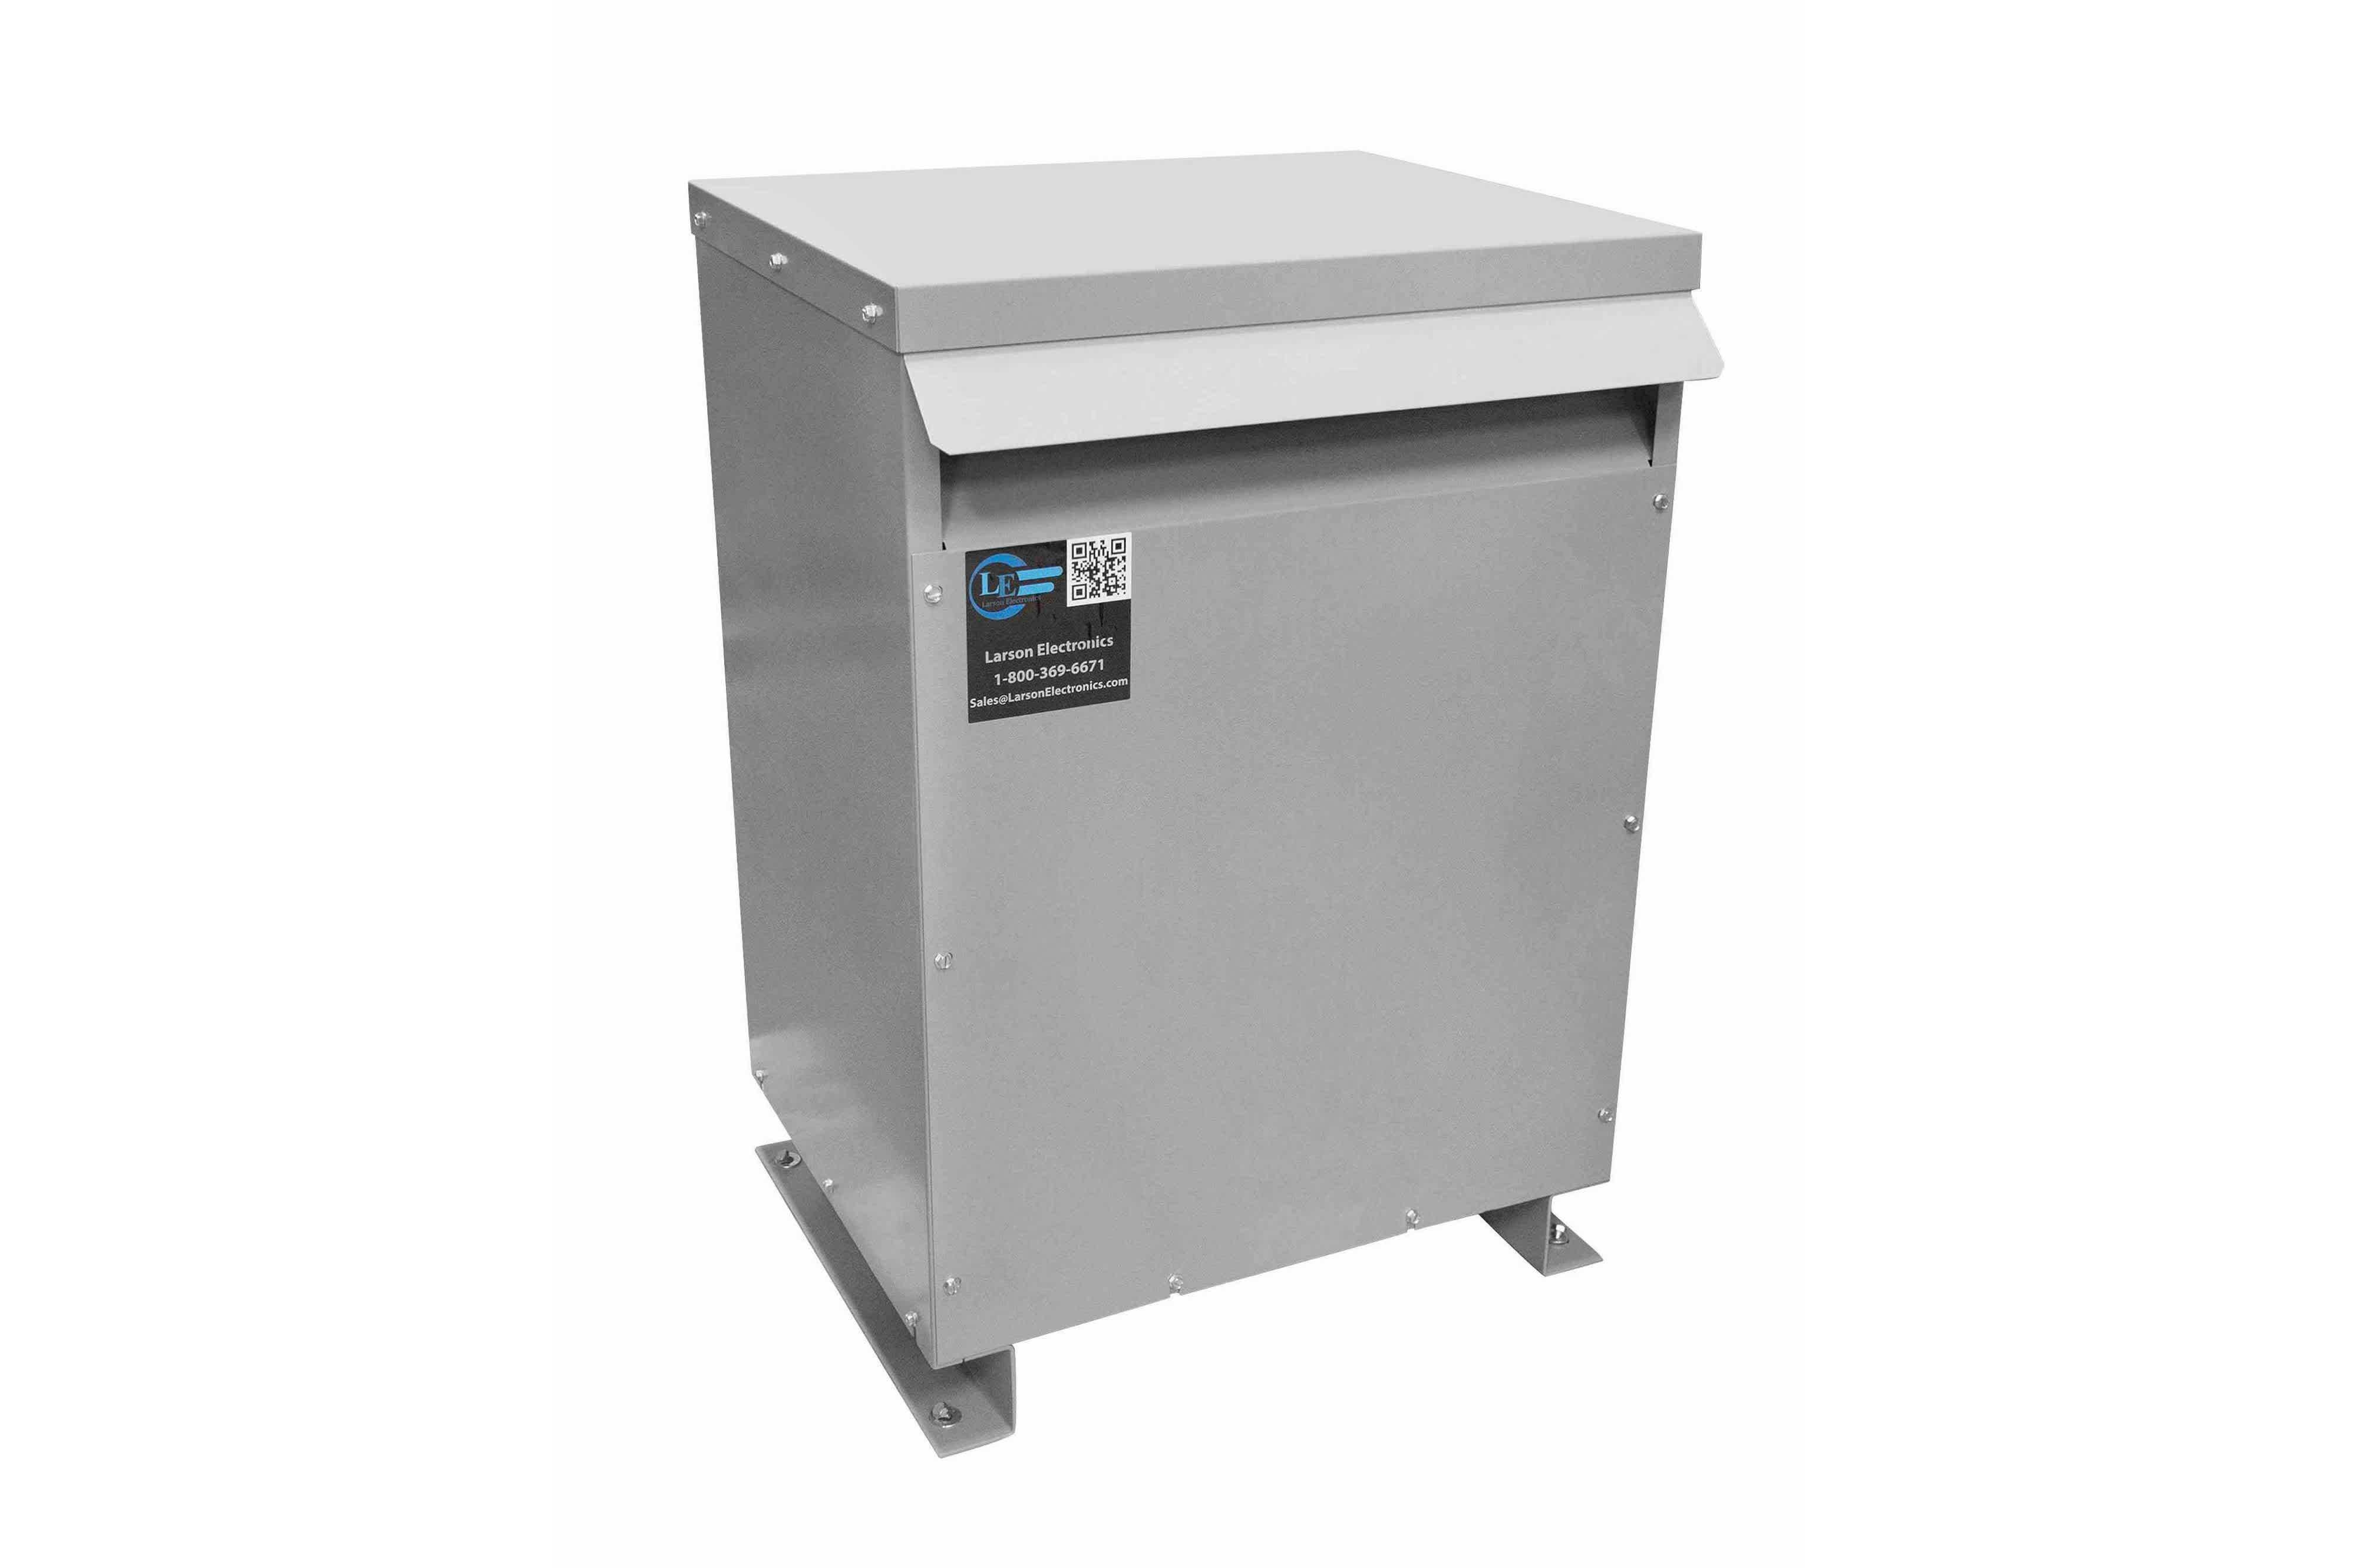 150 kVA 3PH Isolation Transformer, 460V Wye Primary, 400V Delta Secondary, N3R, Ventilated, 60 Hz